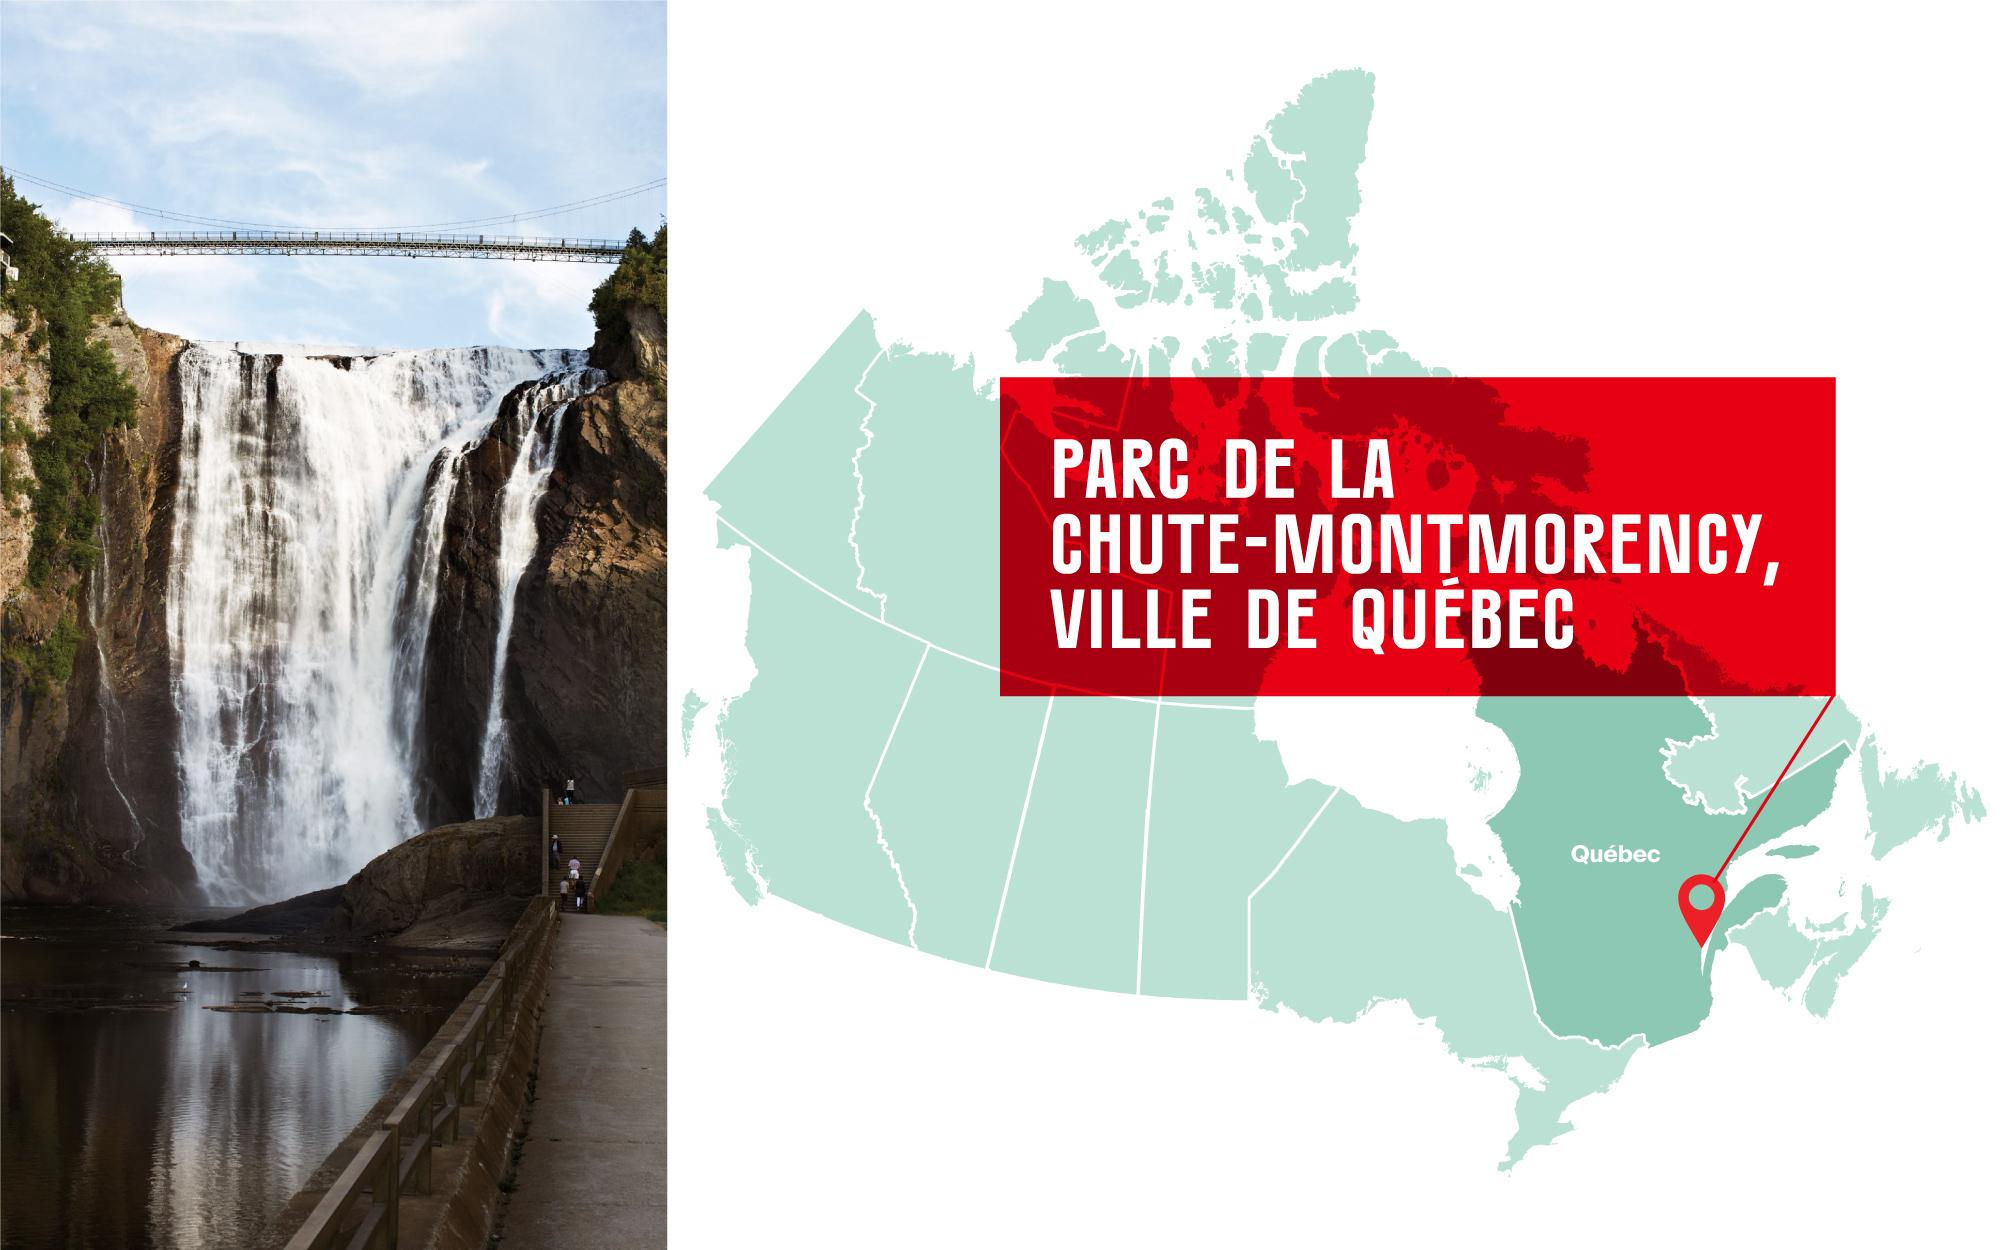 Source : Destination Canada